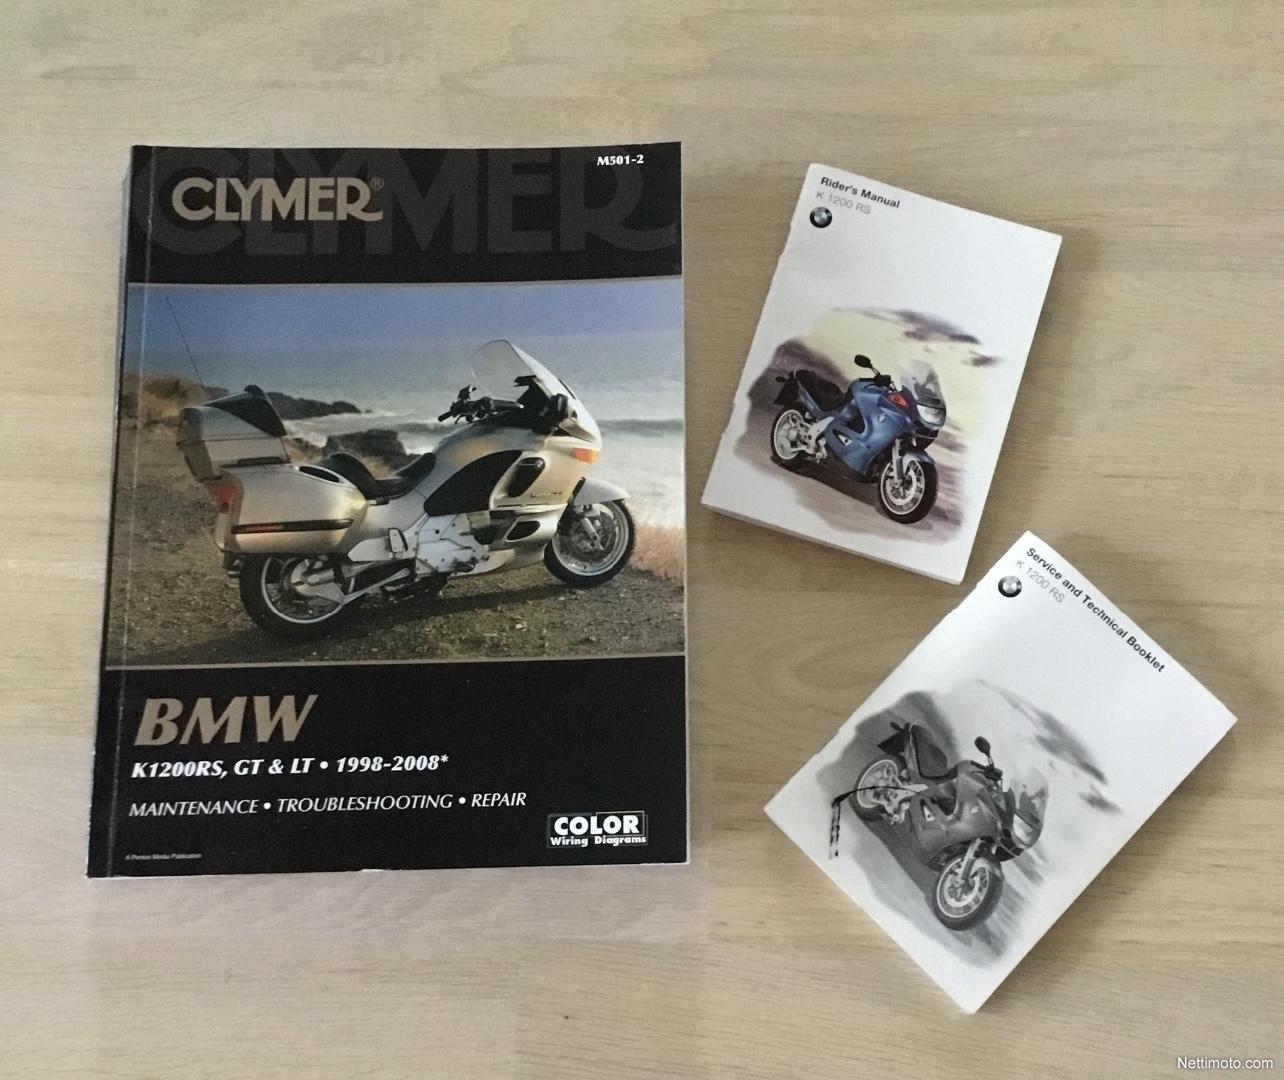 2008 Bmw K Motorcycle Wiring Diagram Library 1200 Rs Facelift 1 200 Cm 2001 Seinjoki